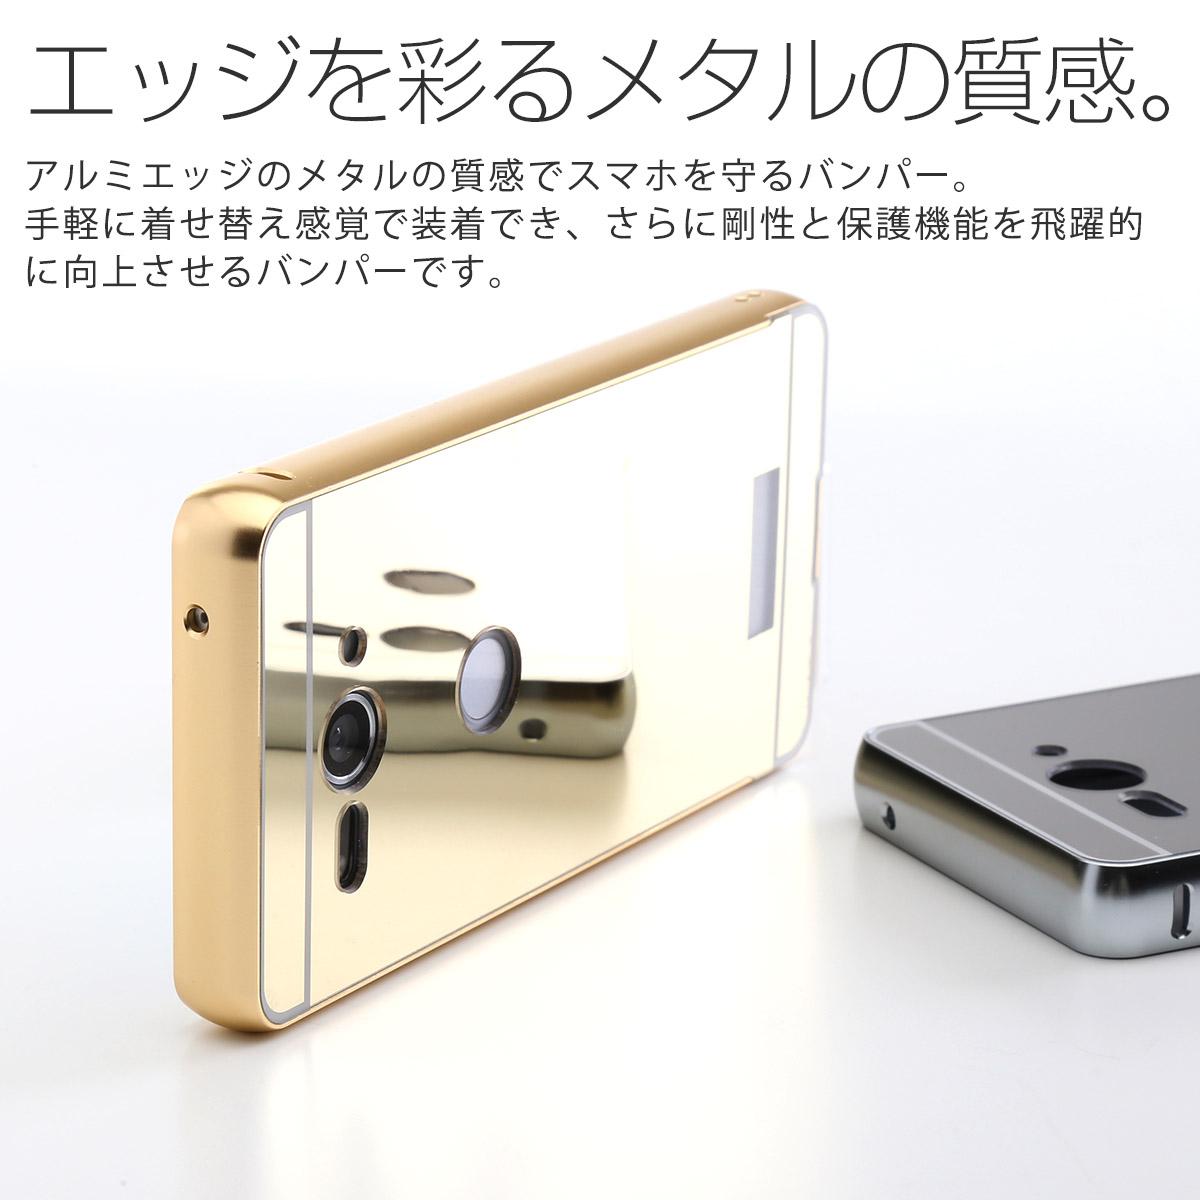 Xperia XZ2 Compact 背面パネル付きバンパーメタルケース